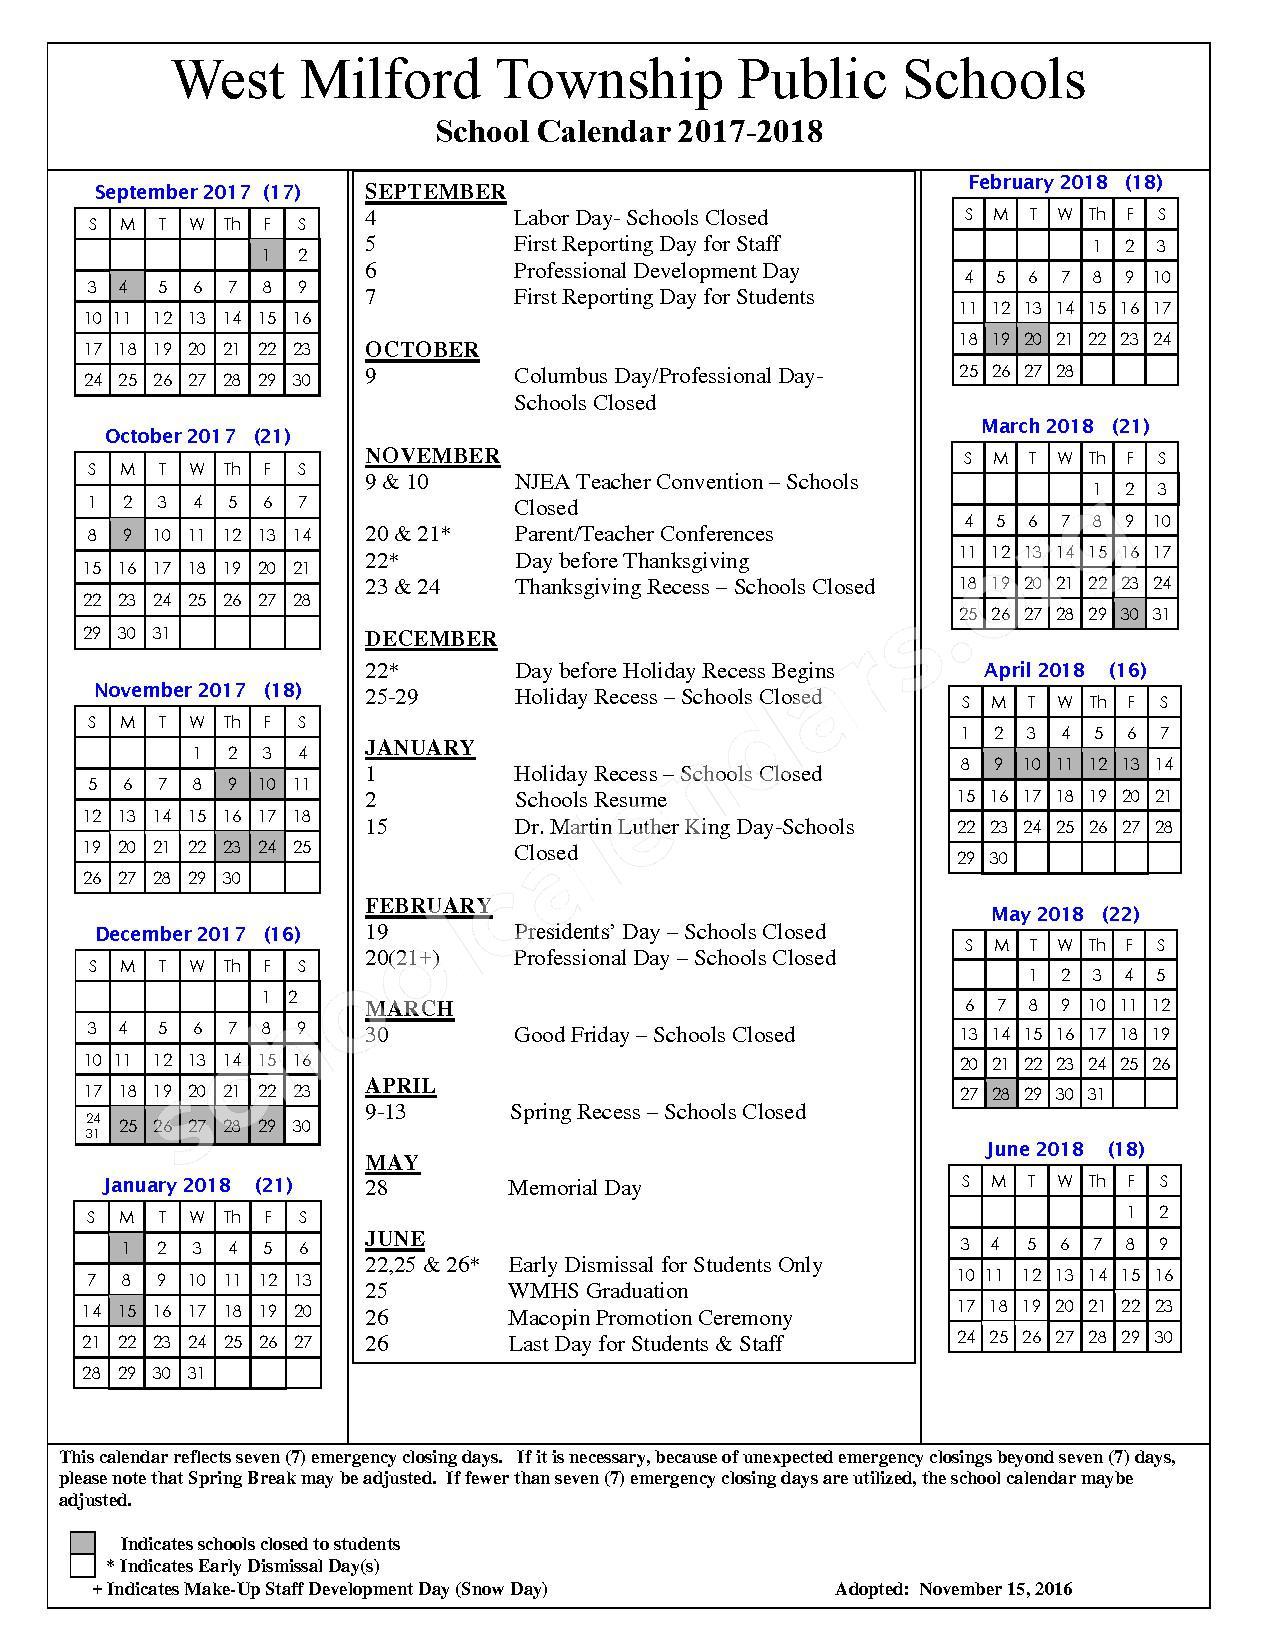 2017 - 2018 School Calendar – West Milford Township Public Schools – page 1